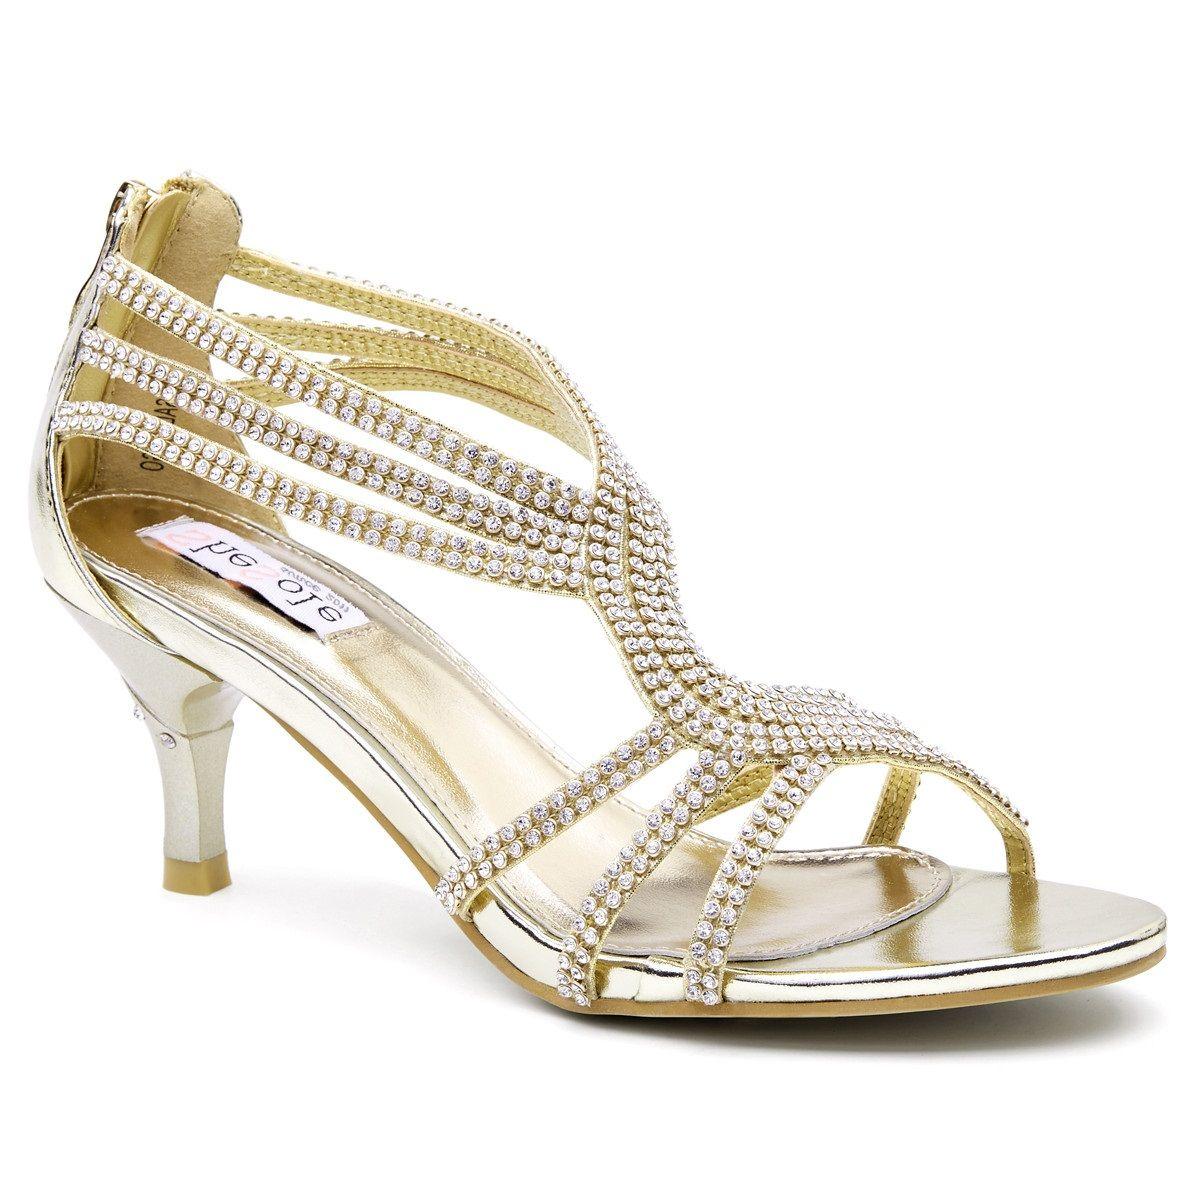 Bridal Sandals Wedding Kitten Heel Shoes Gold Heels Vintage Lace Weddings Dresses Mid Best Gifts Low